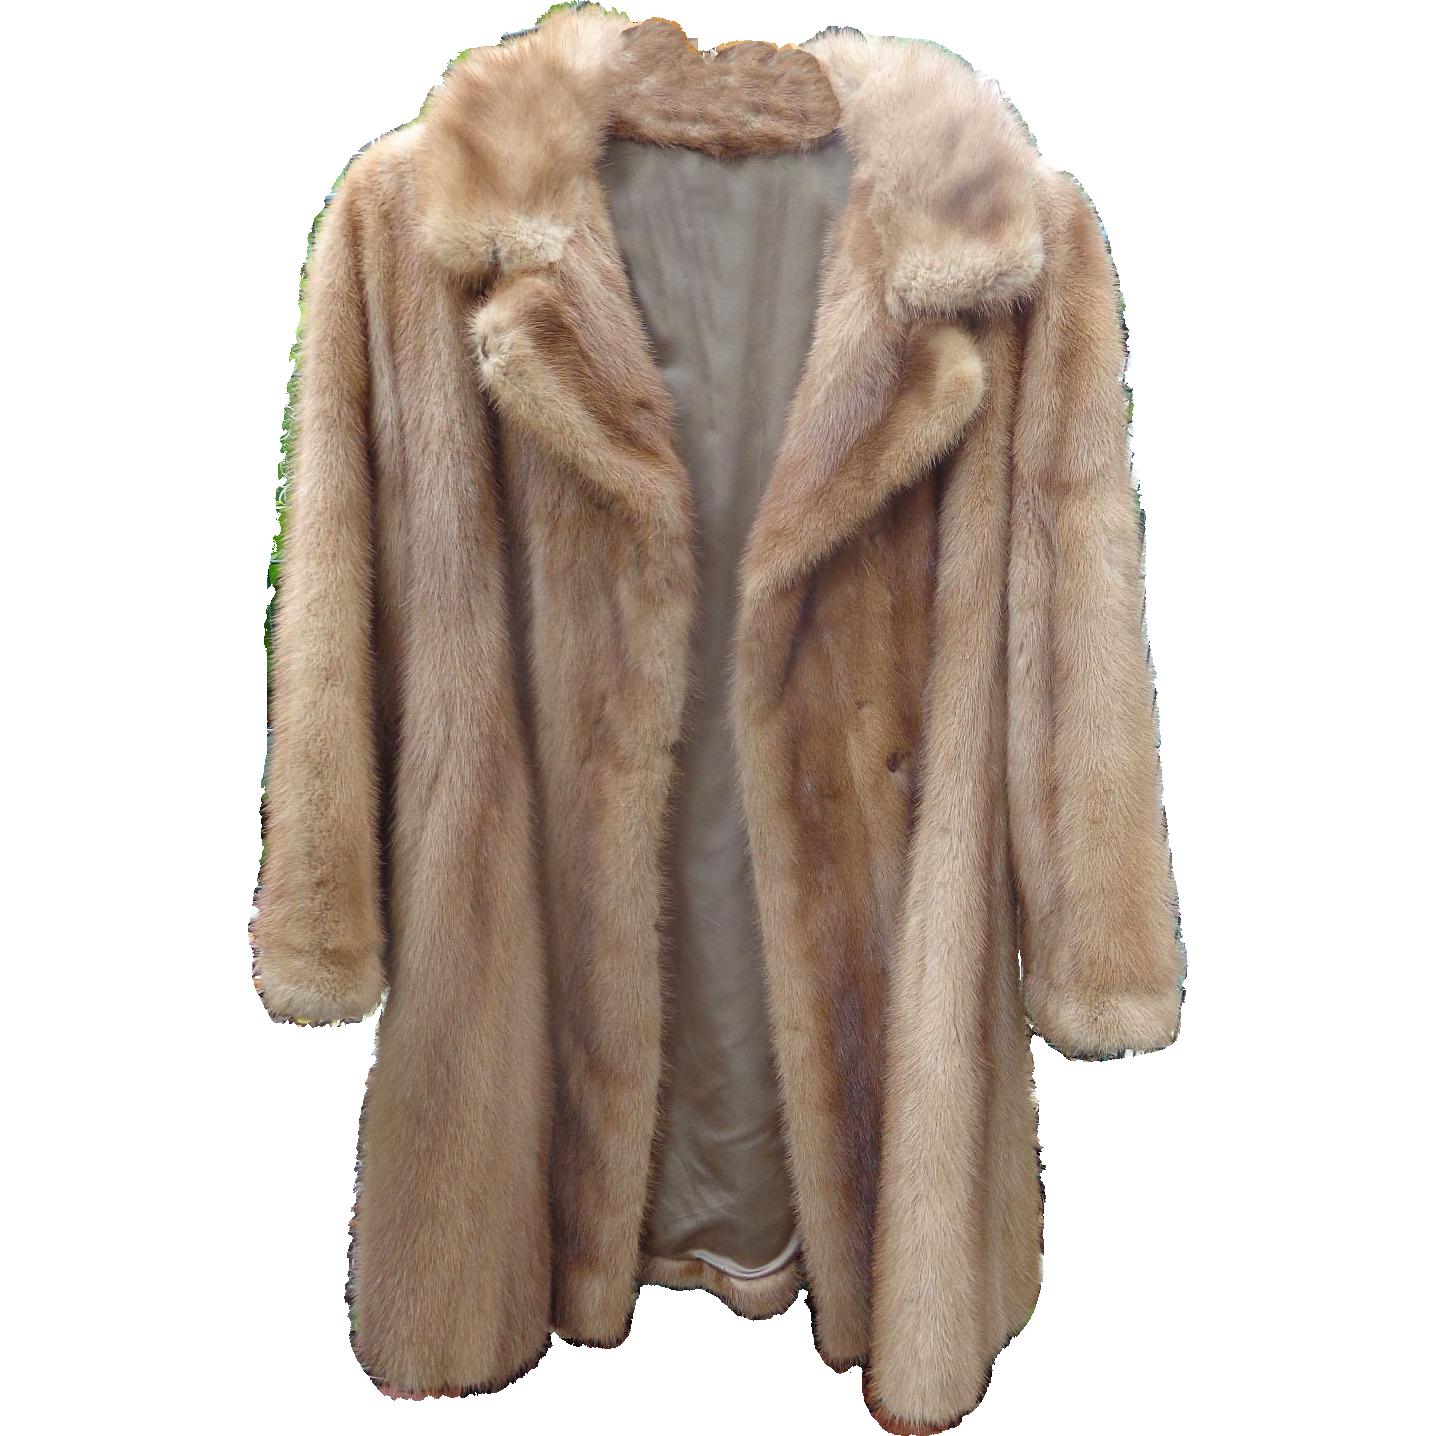 Faux Fur Coat Png Image Coat Vintage Fur Jacket Fur Coat